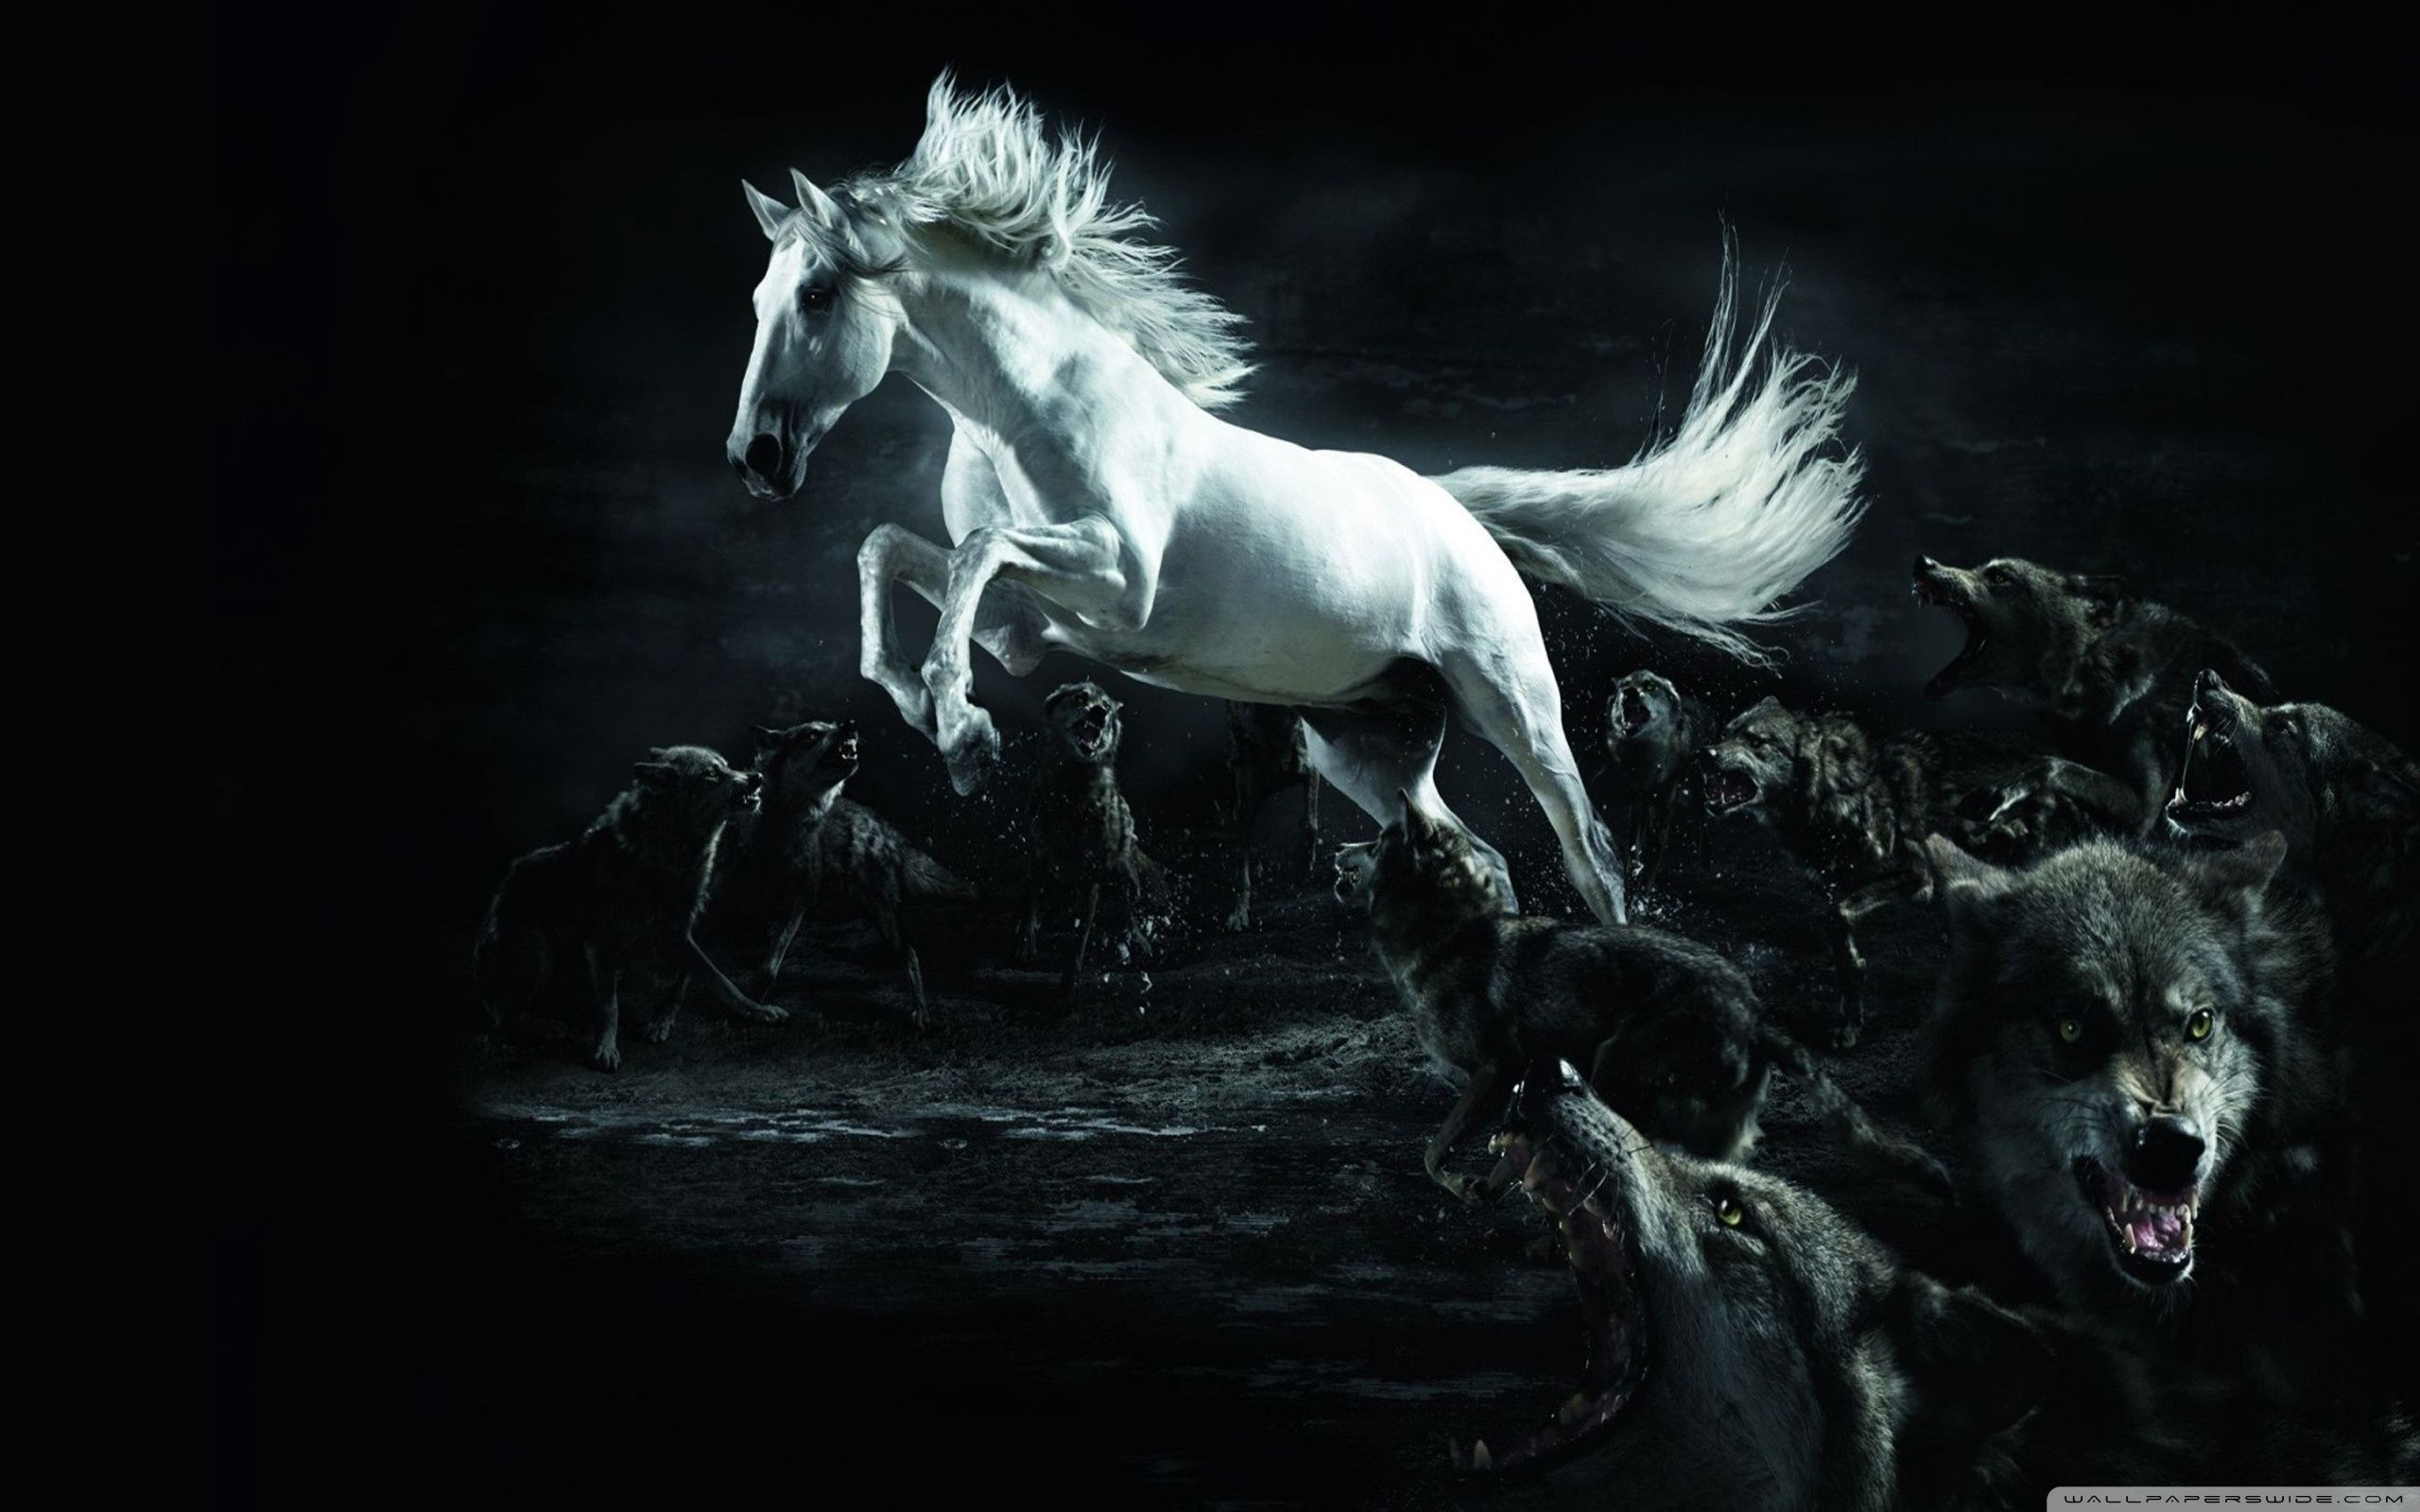 Caballos Horse Wallpaper Horses Horse Pictures